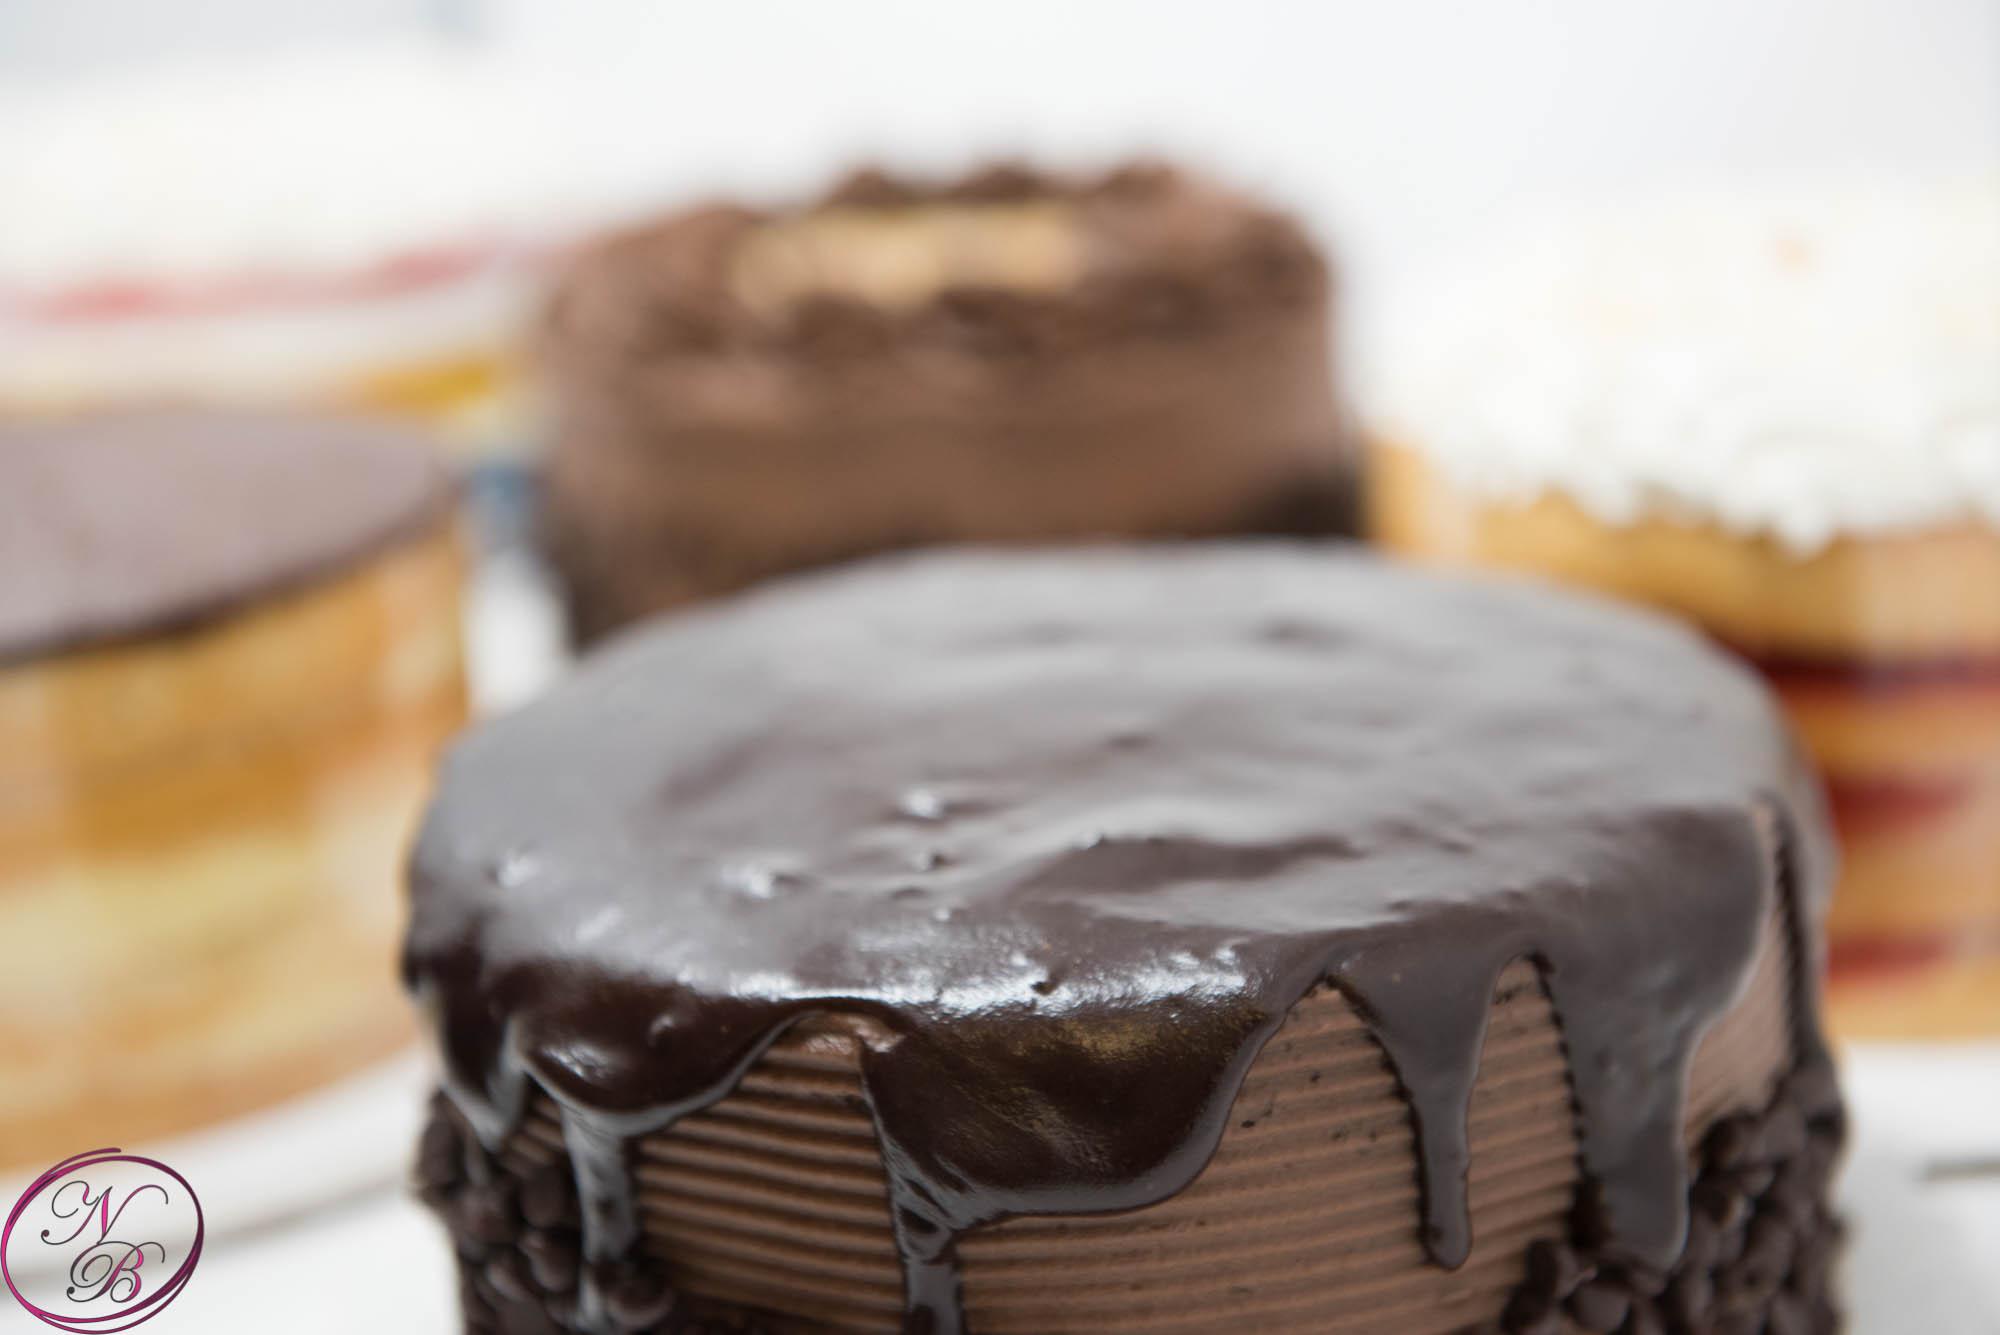 Sinful Dessert Cakes – 8 Flavors